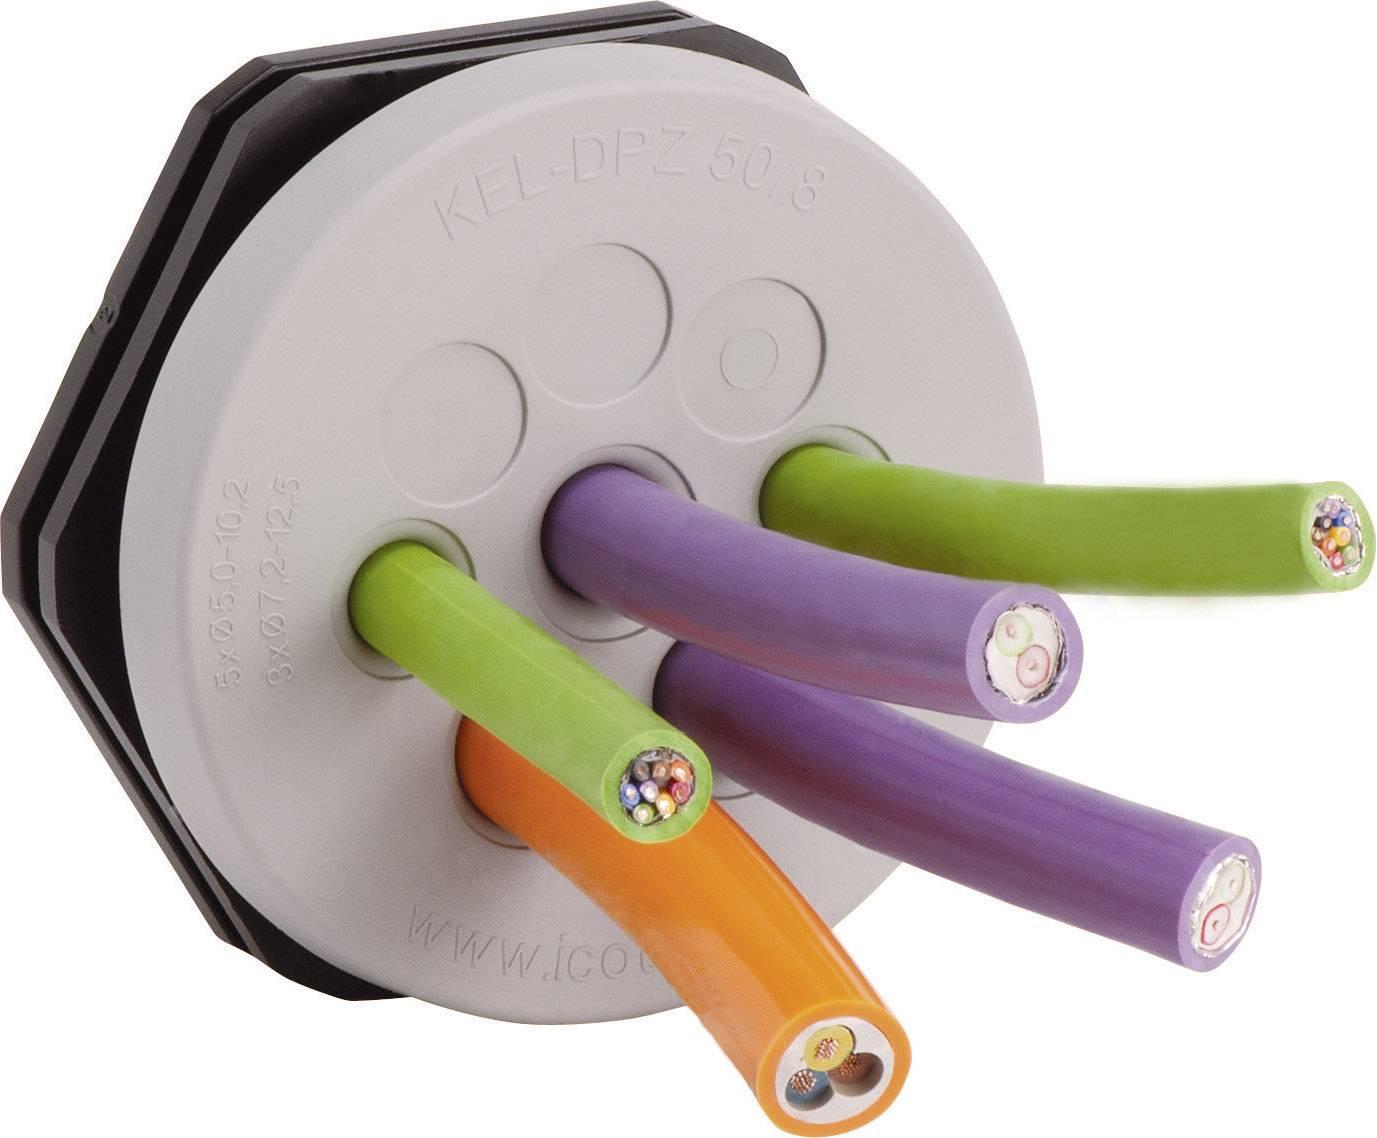 Icotek Uvodnica za kable KEL-DPZ okrogla KEL-DPZ 50|19 velikost: M50 poliamid/elastomer, siva